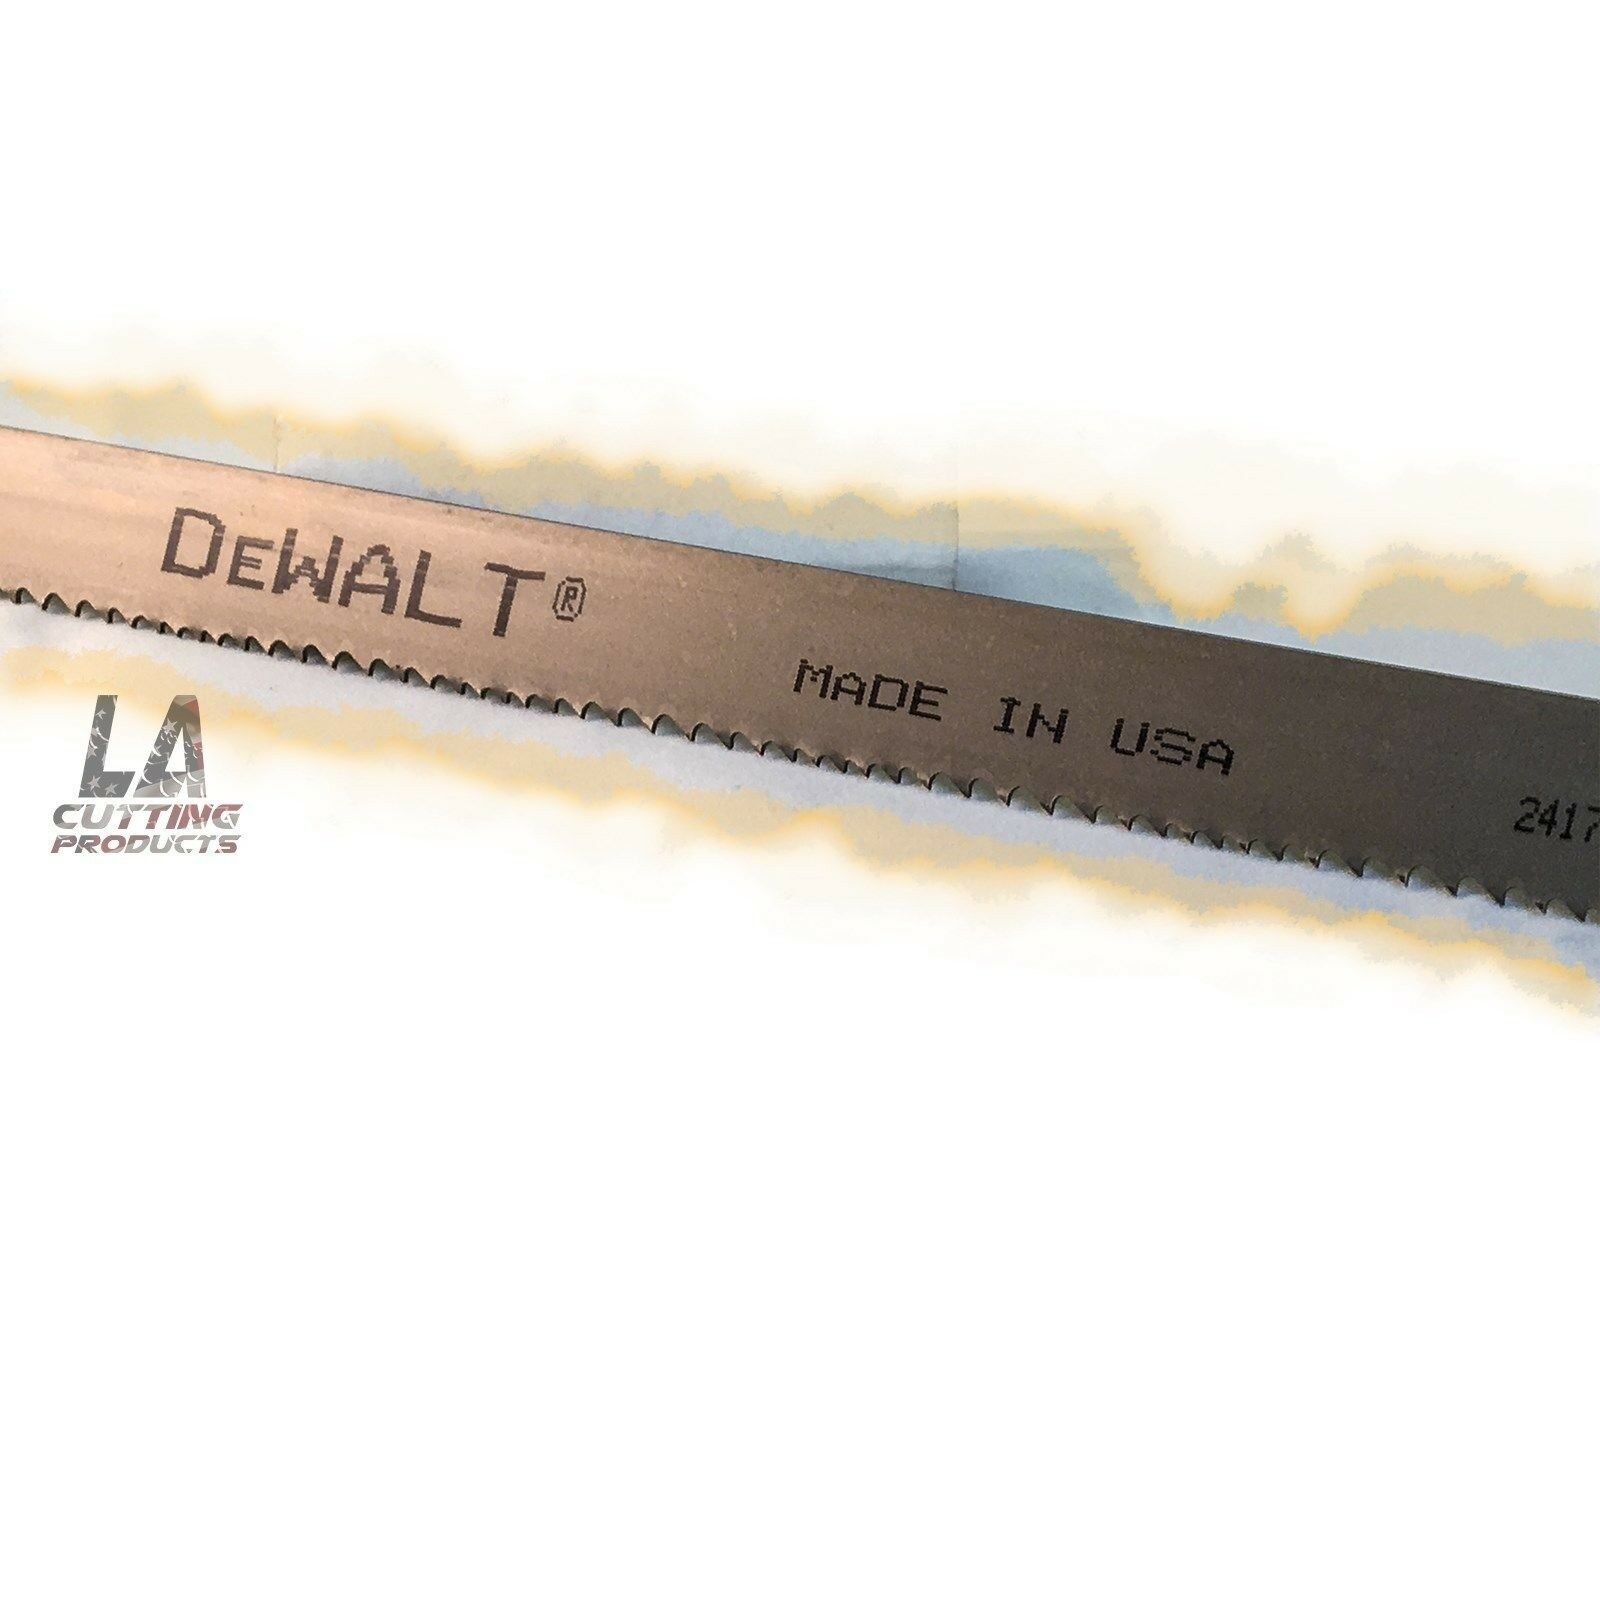 "107 1//2/"" 8/'-11 1//2/"" x 3//4/"" x .035/"" x 10//14N Band Saw Blade M42 Bi-metal 1 Pcs"